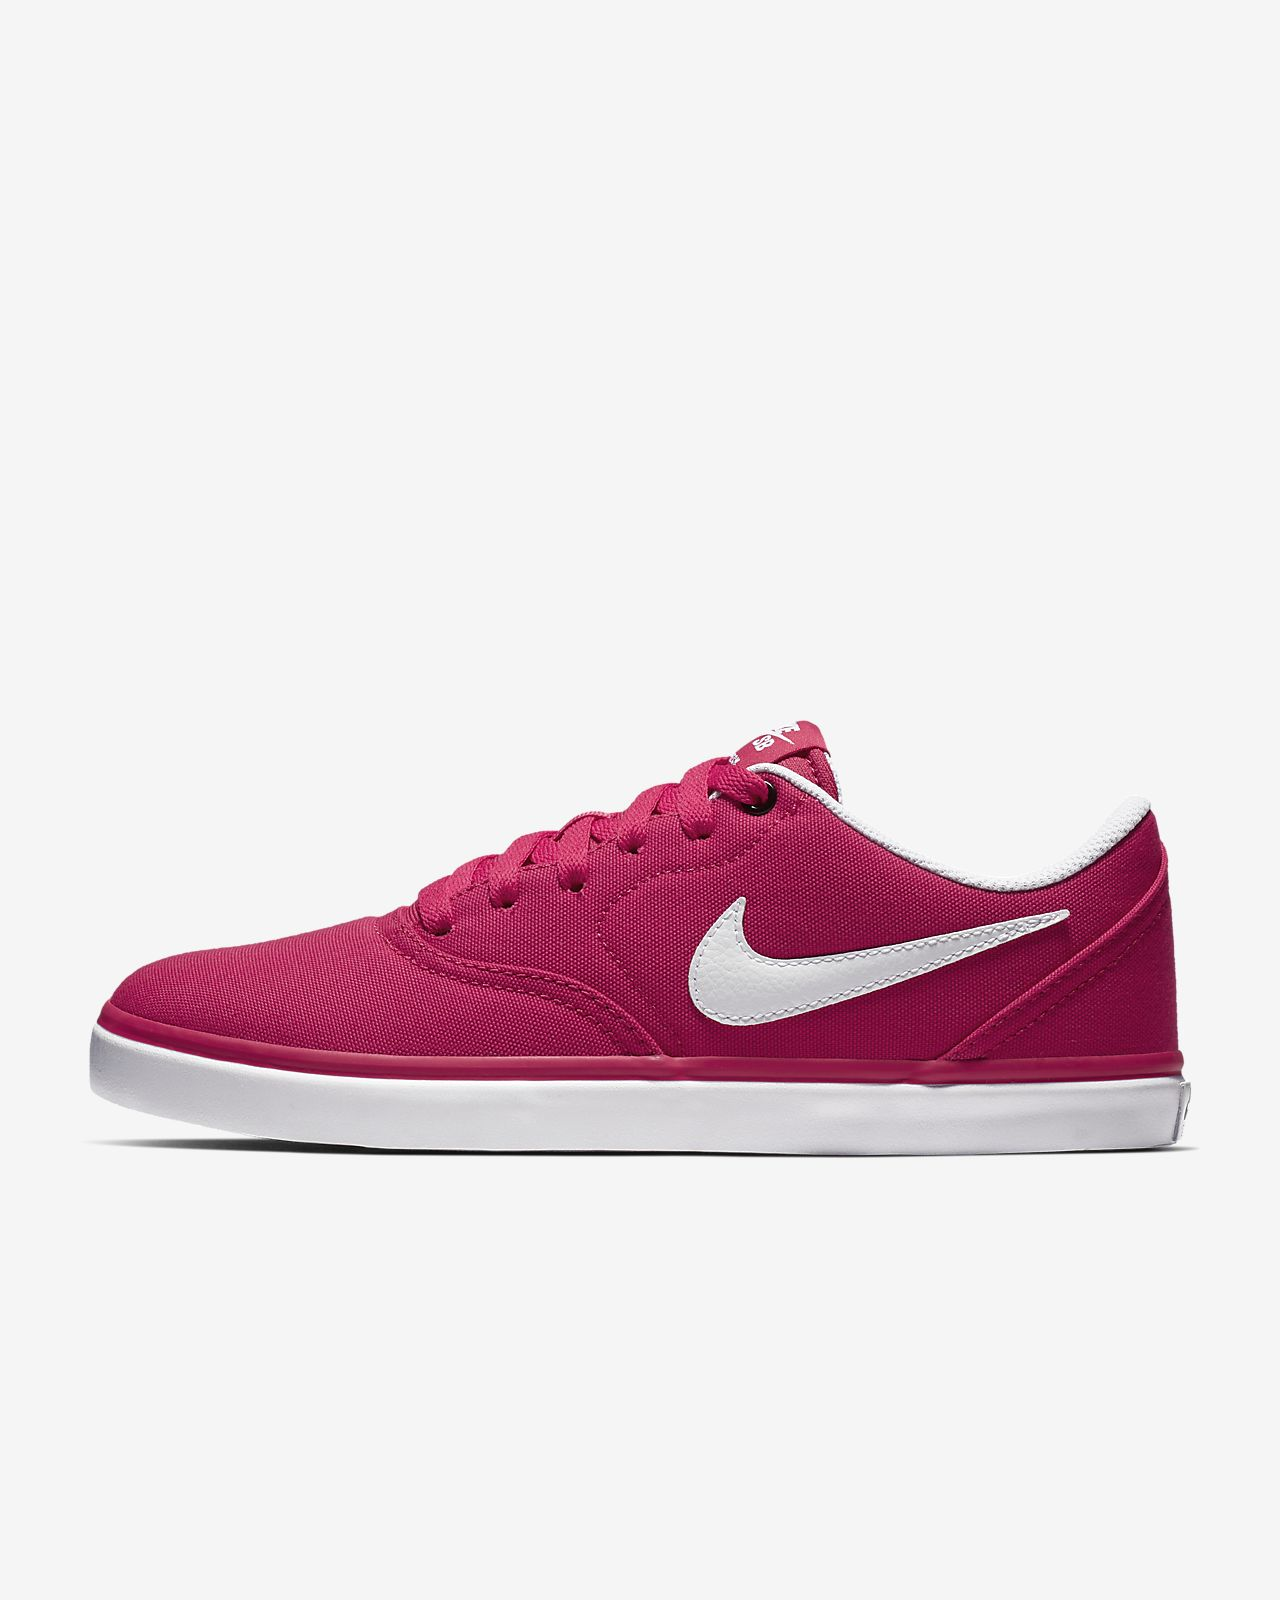 Nike SB Check Solarsoft Canvas Damen-Skateboardschuh